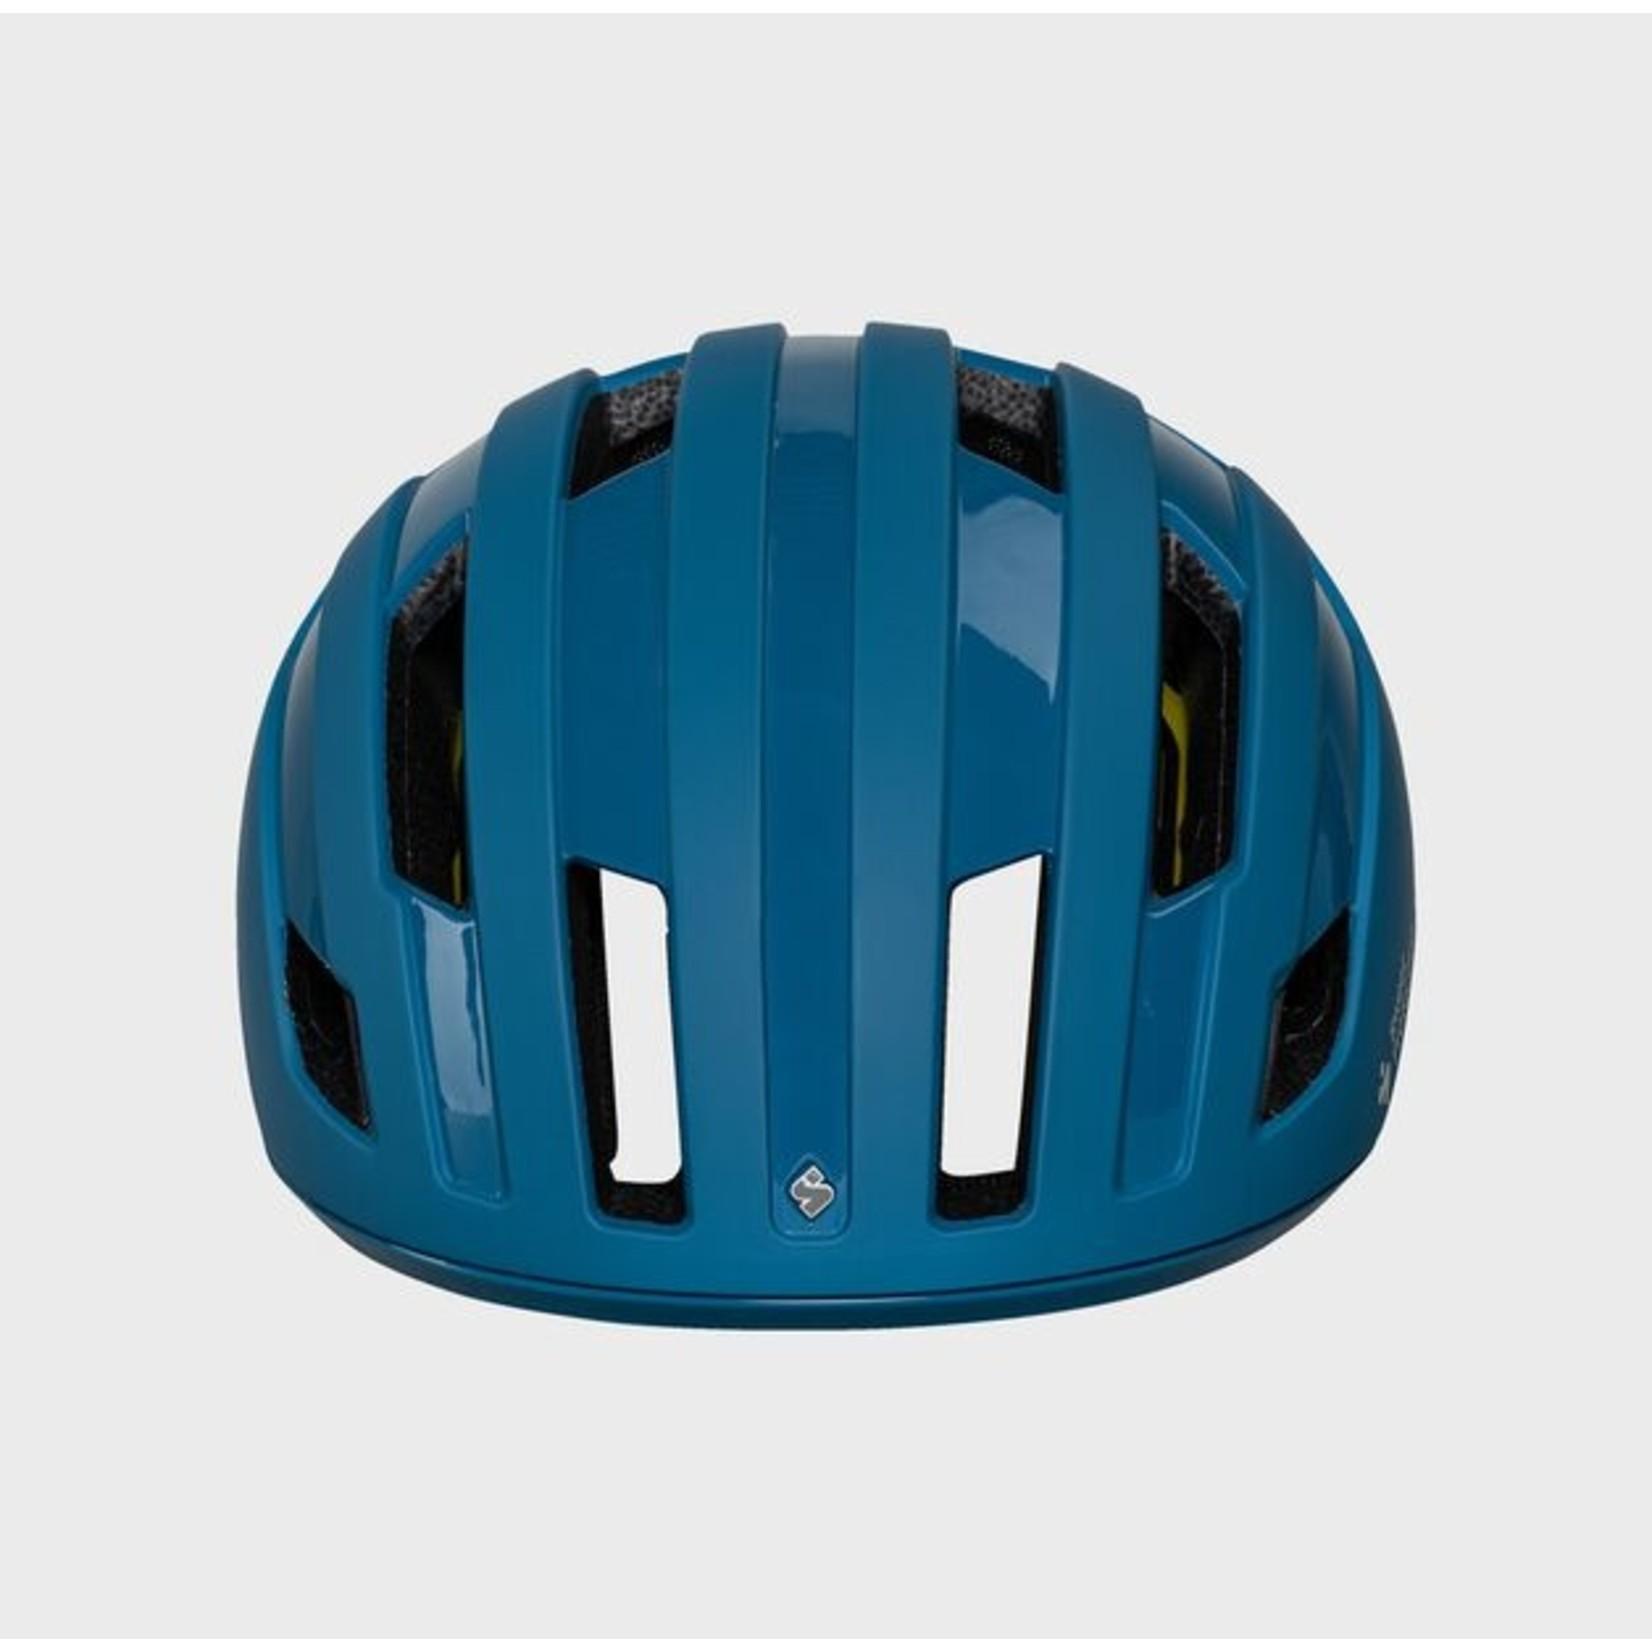 Sweet Protection Sweet Protection Outrider MIPS Helmet - Matt Aqua Marine